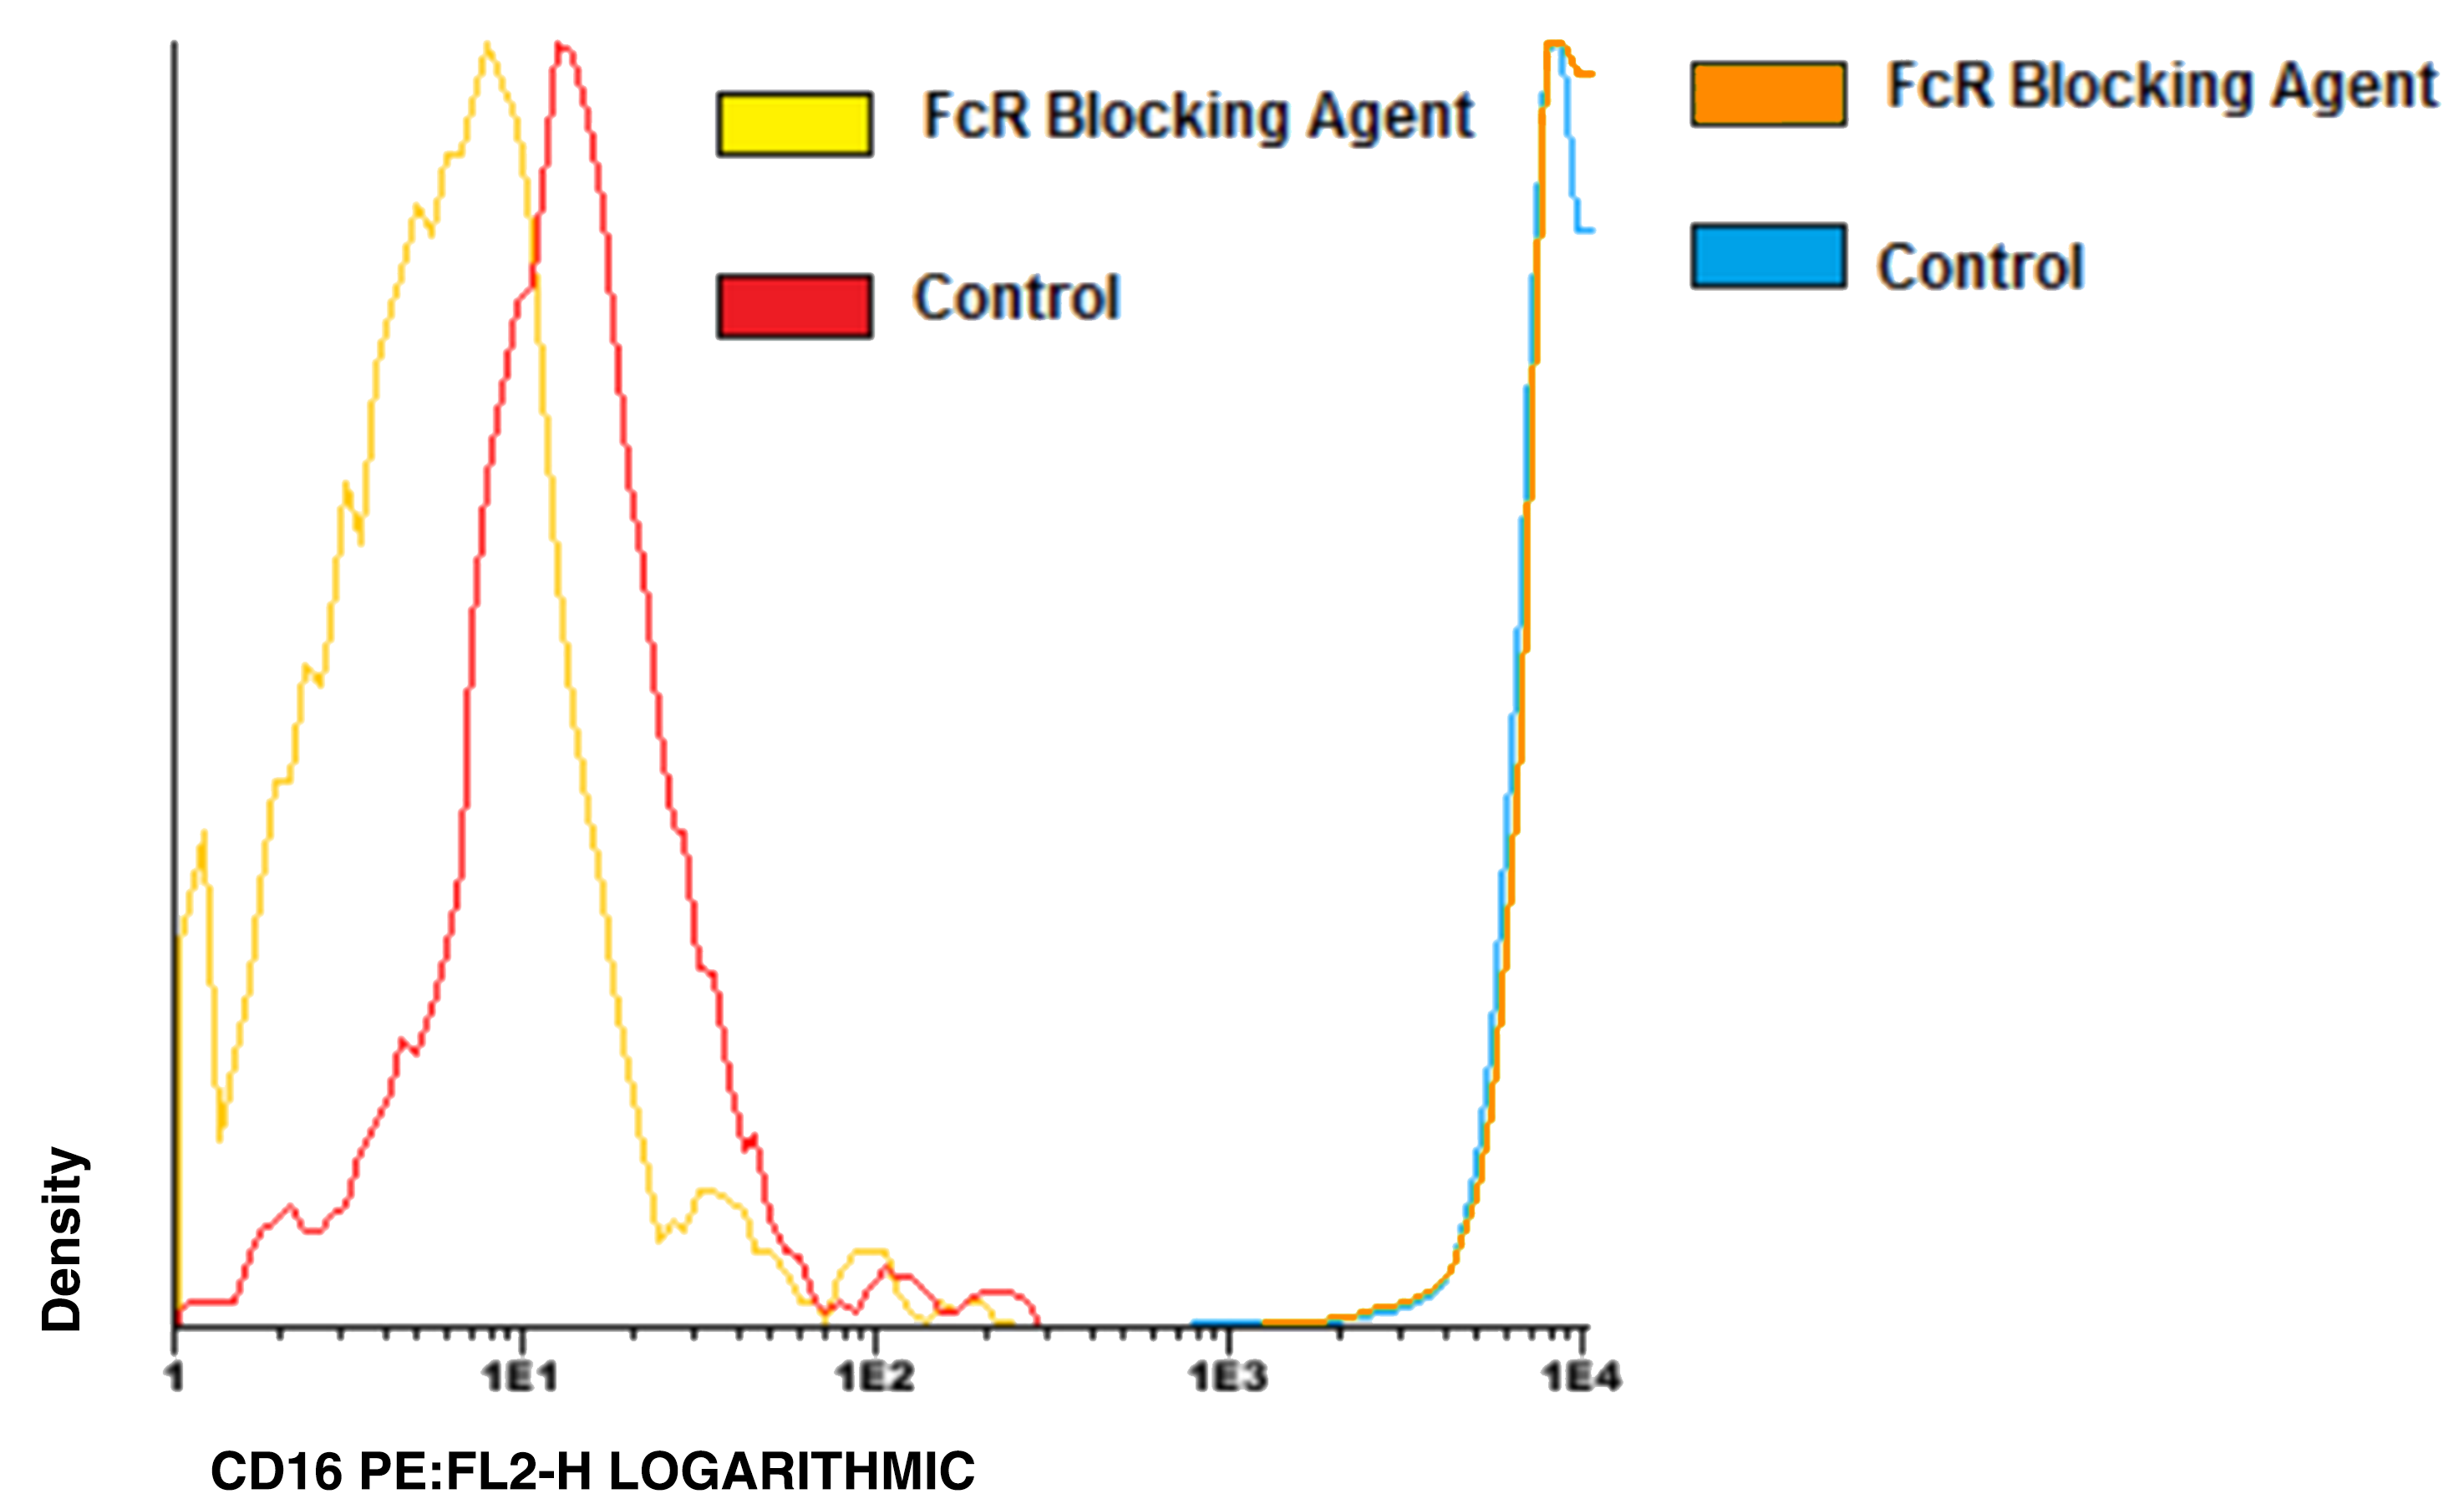 FcR Blocking Reagents